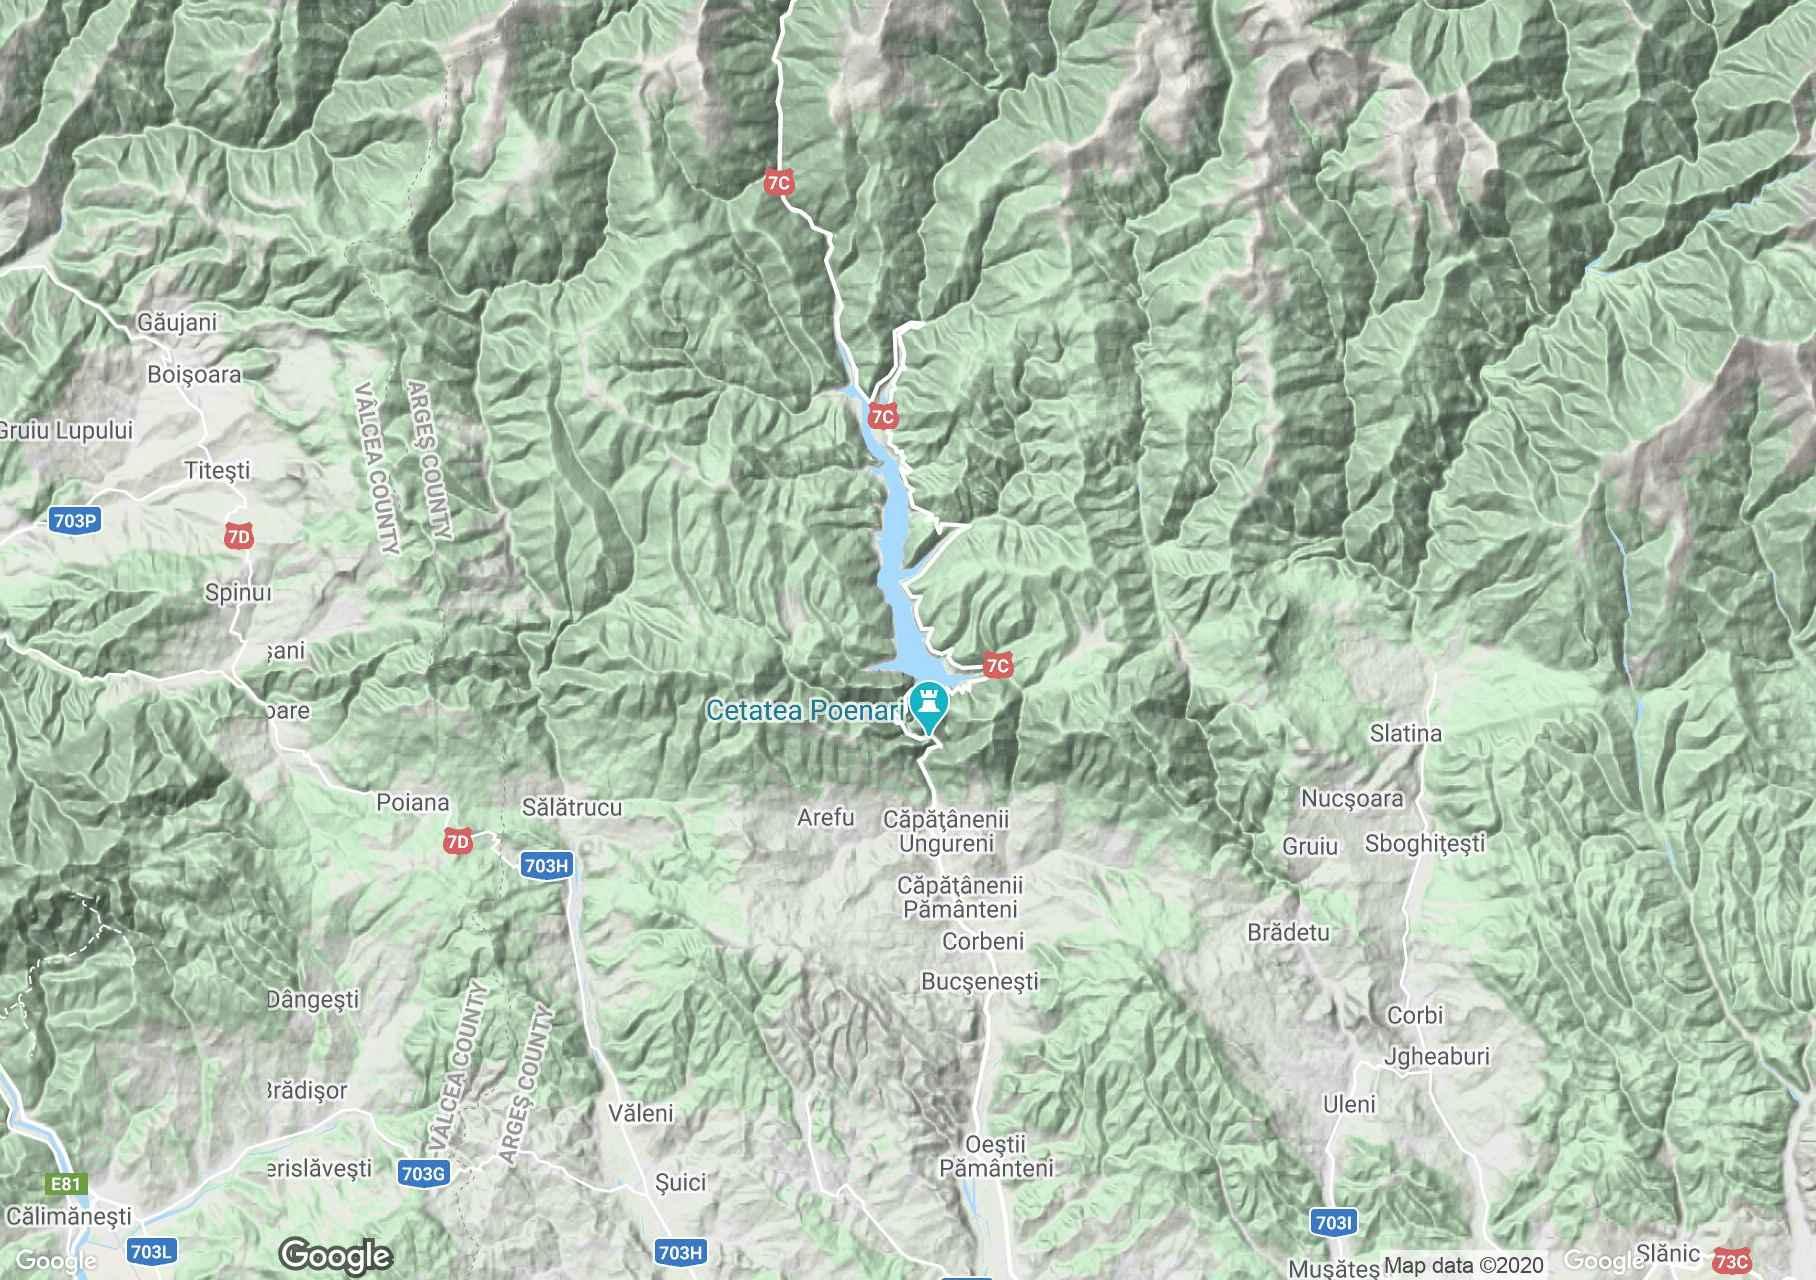 Fogarasi havasok: Vidraru környéke interaktív turista térképe.